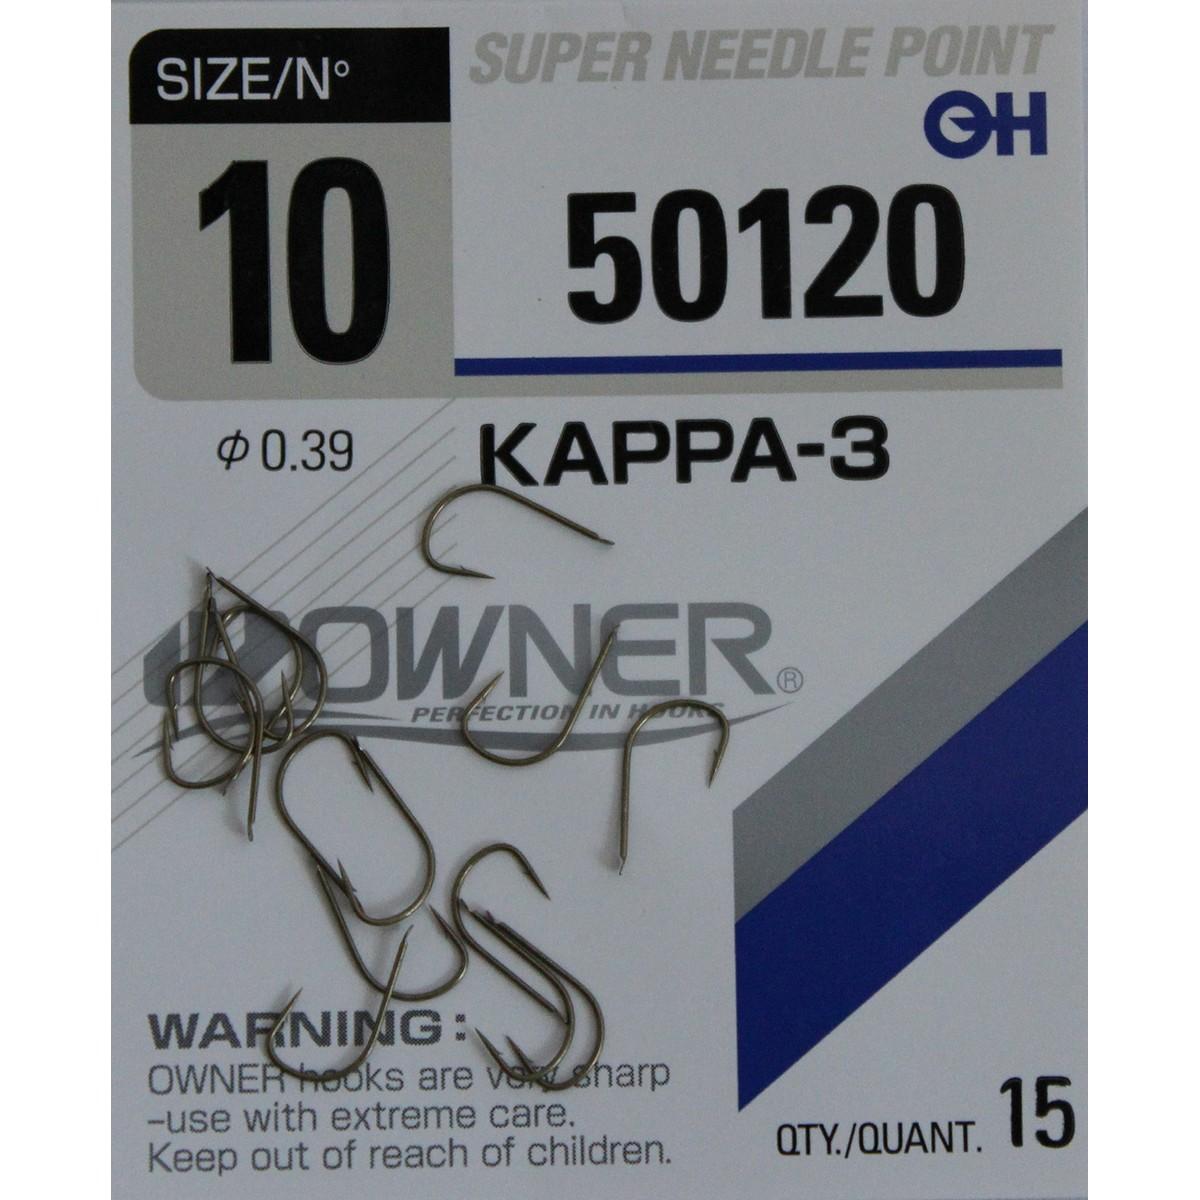 Риболовна кука Owner Kappa-3 50120